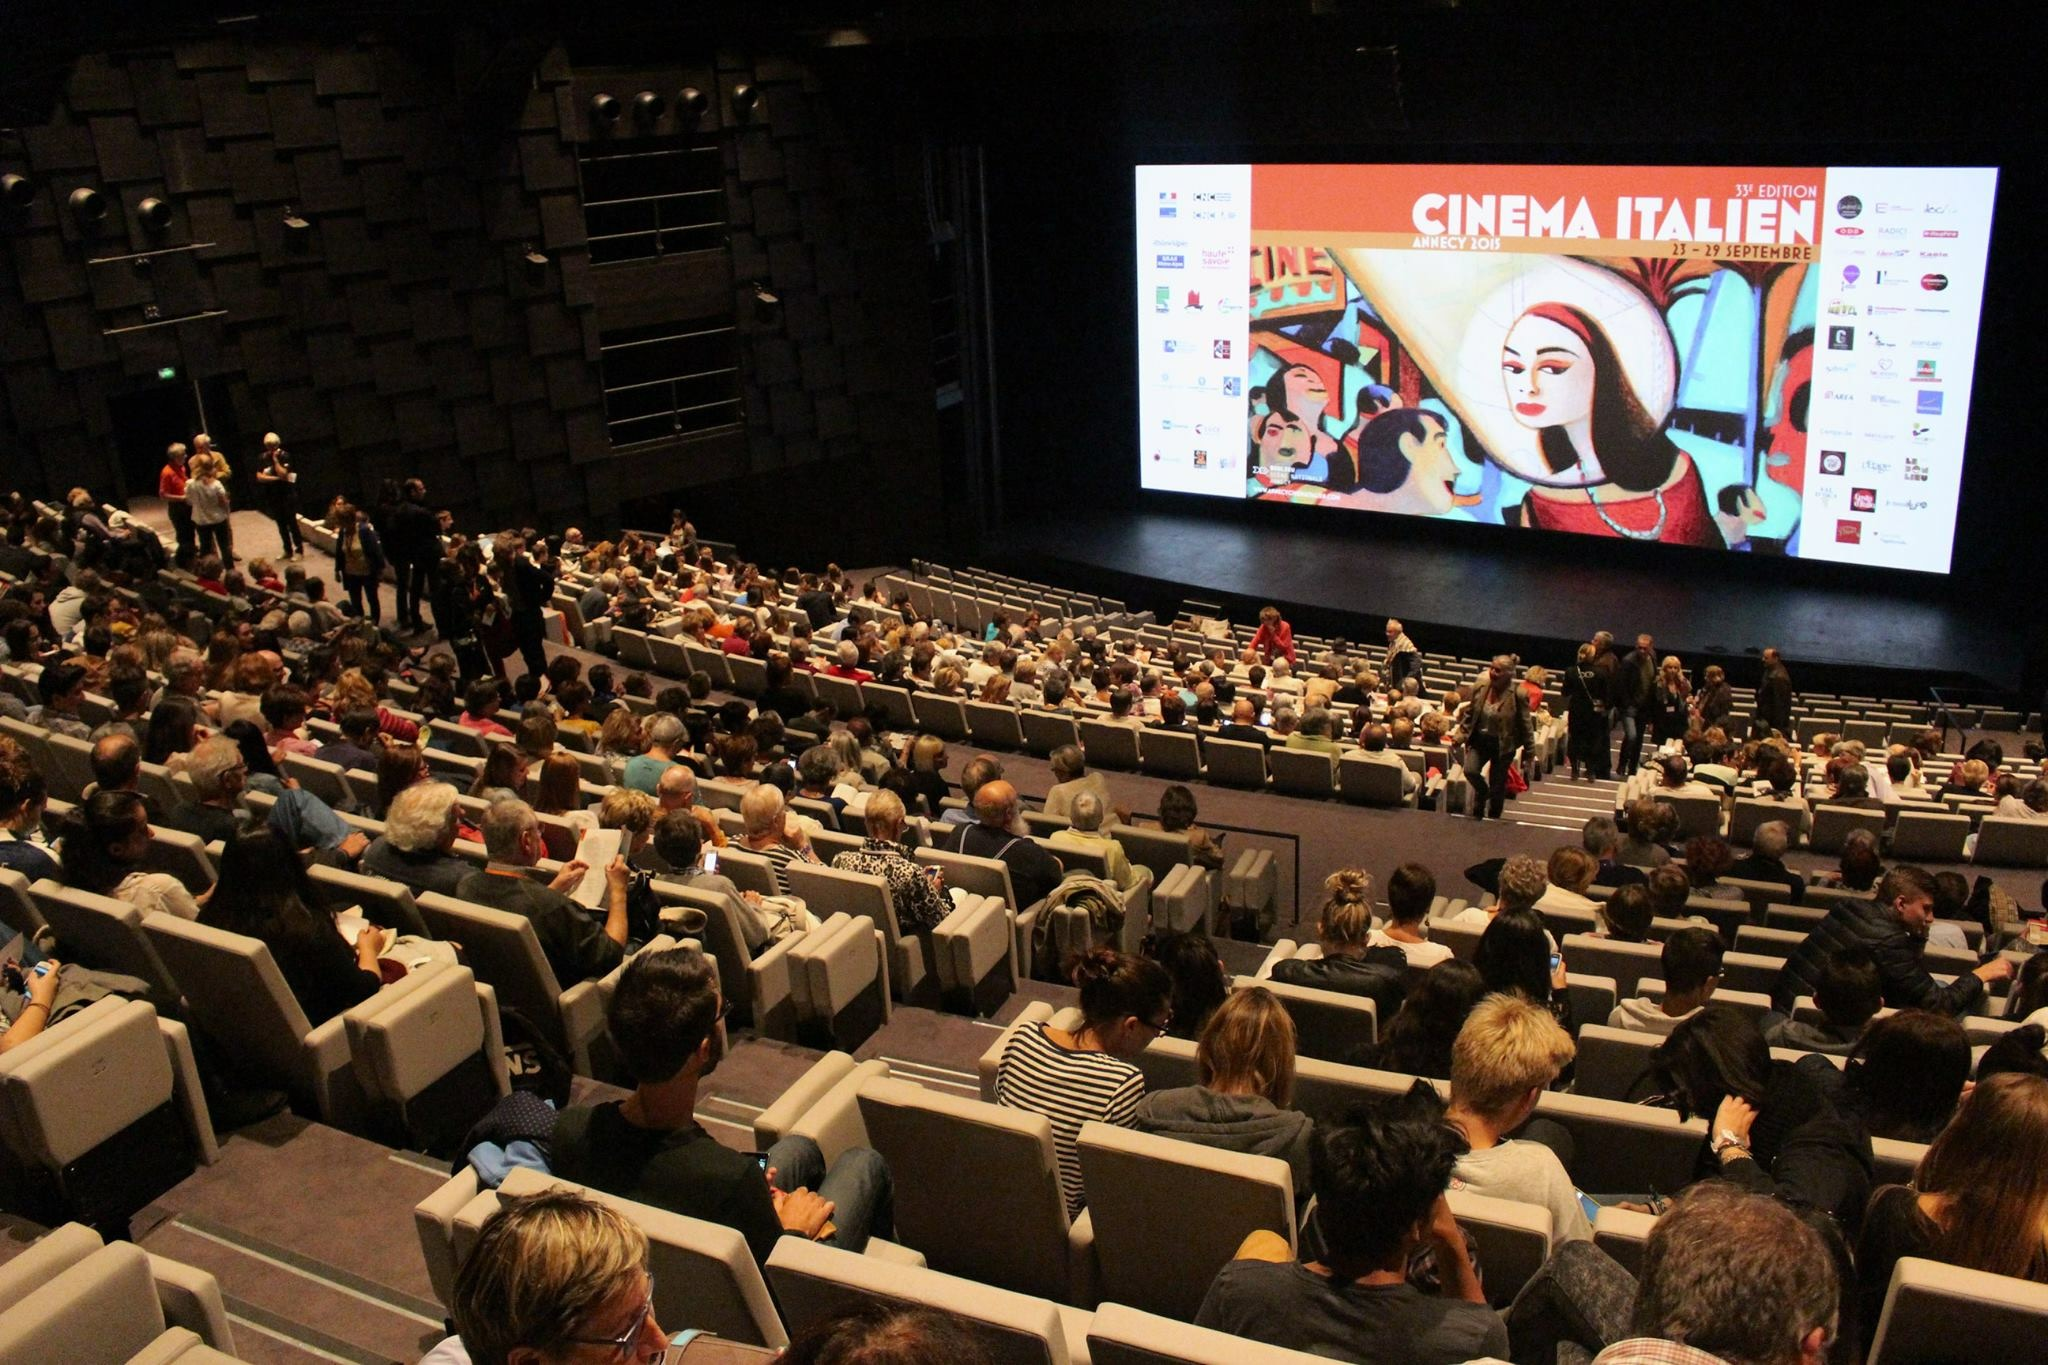 Copyright: Festival du Cinema Italien